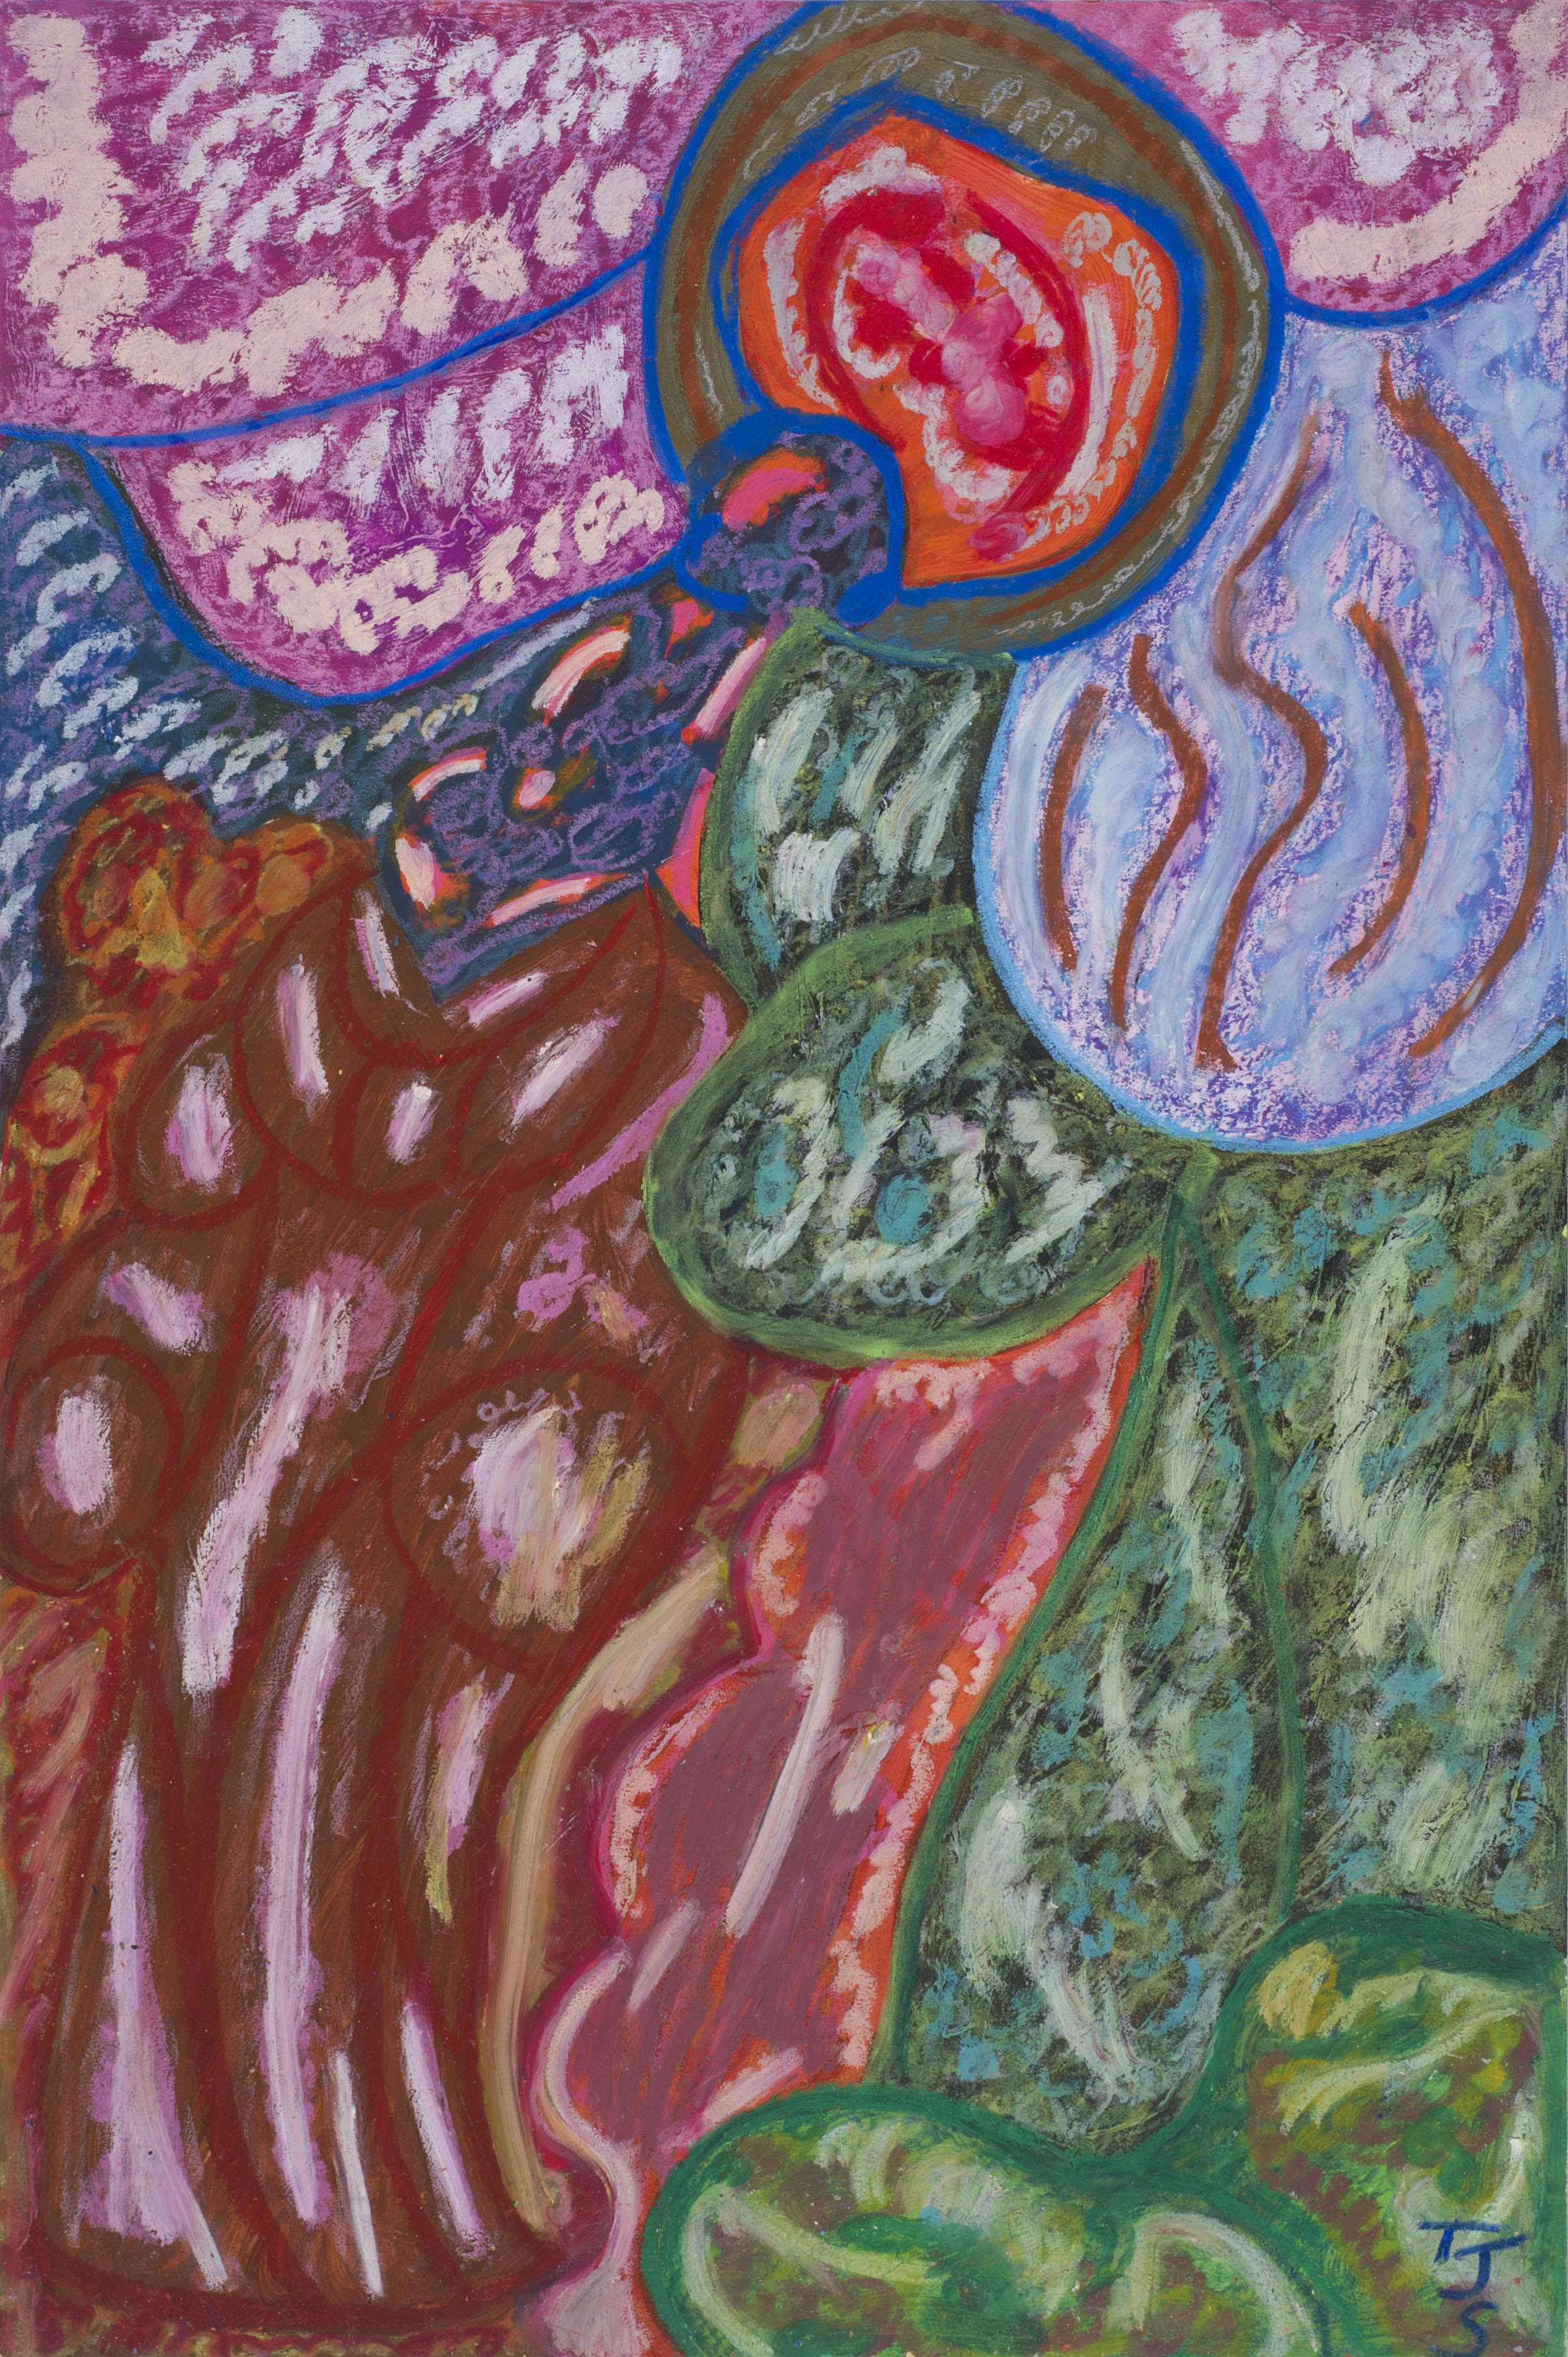 Anthony Joseph Salvatore    Psalms 138, v. 5  , 1993 Oil stick, acrylic/illustration board 30 x 24 inches 76.2 x 61 cm JS 483